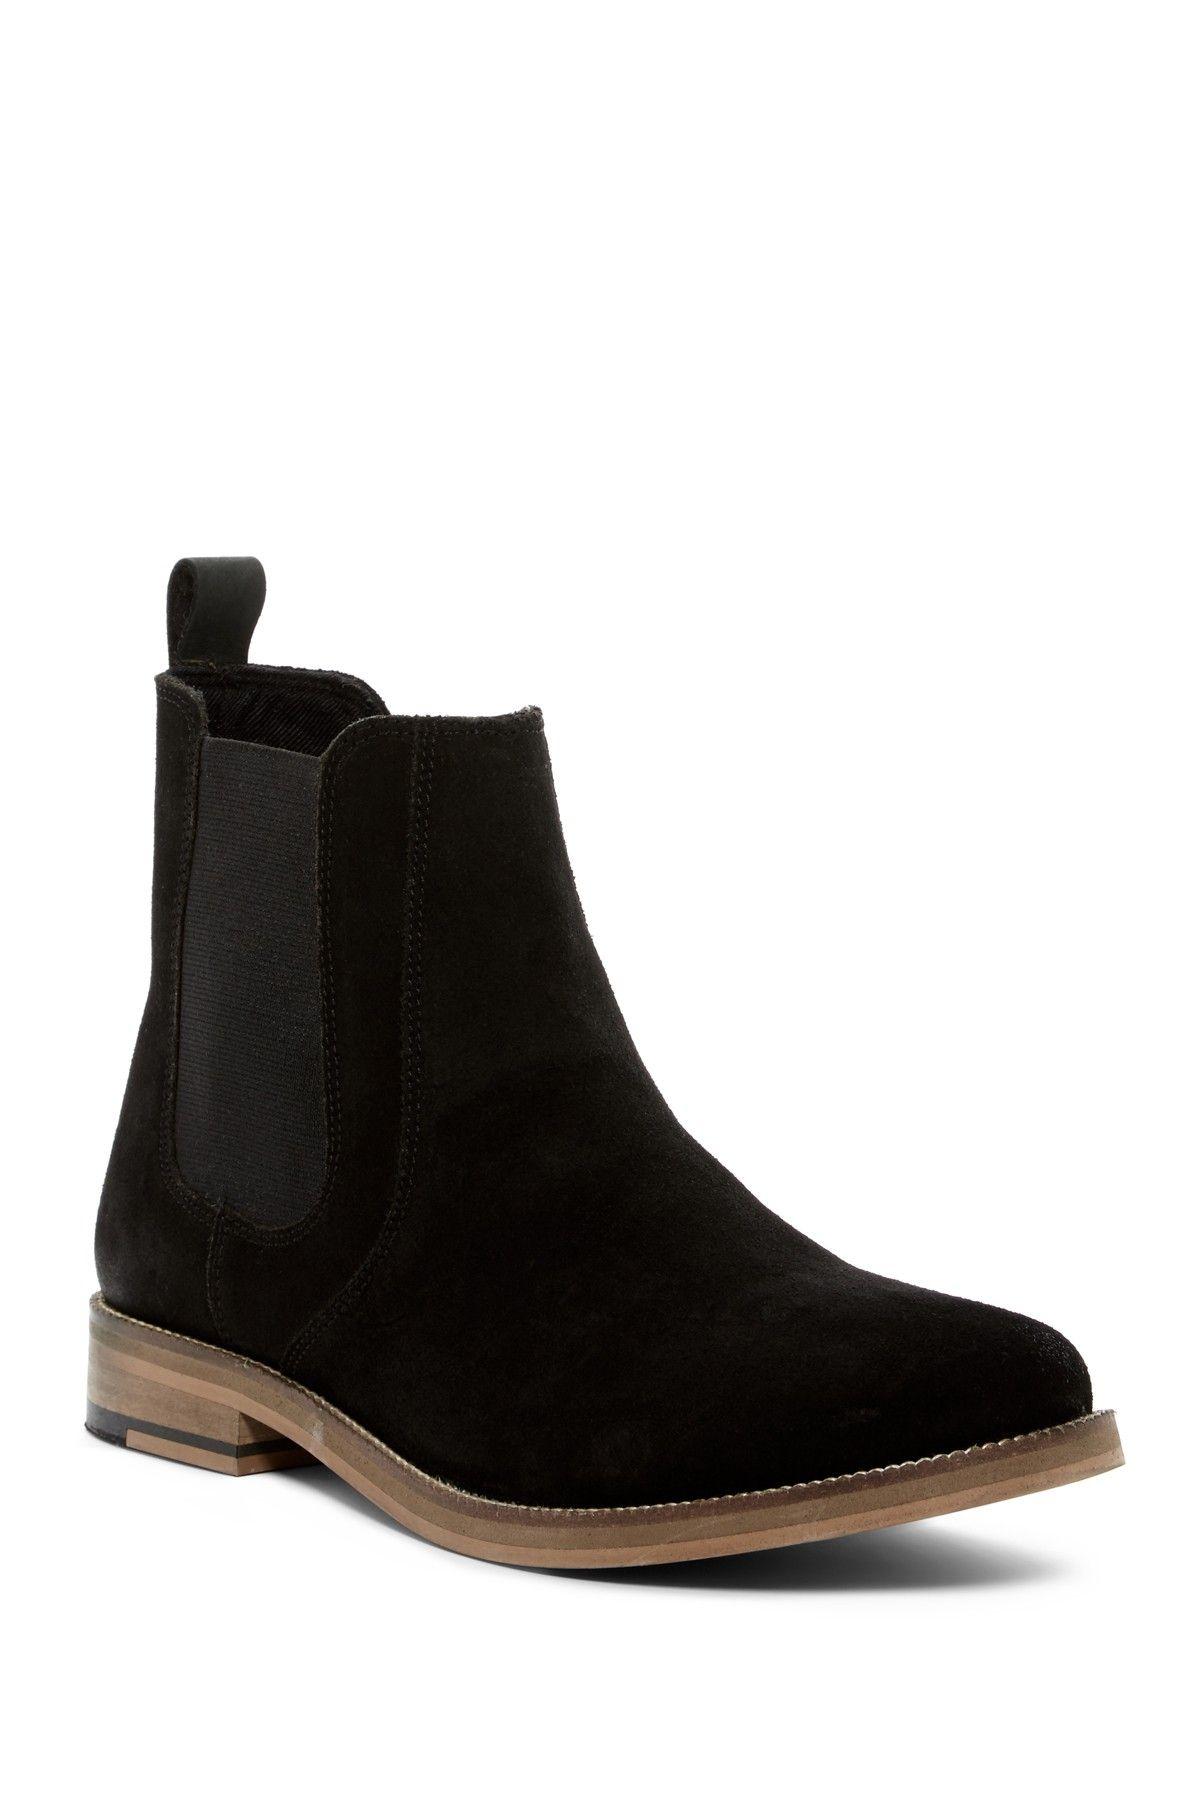 f18a84c5f35 Denham Leather Chelsea Boot by Crevo on  nordstrom rack